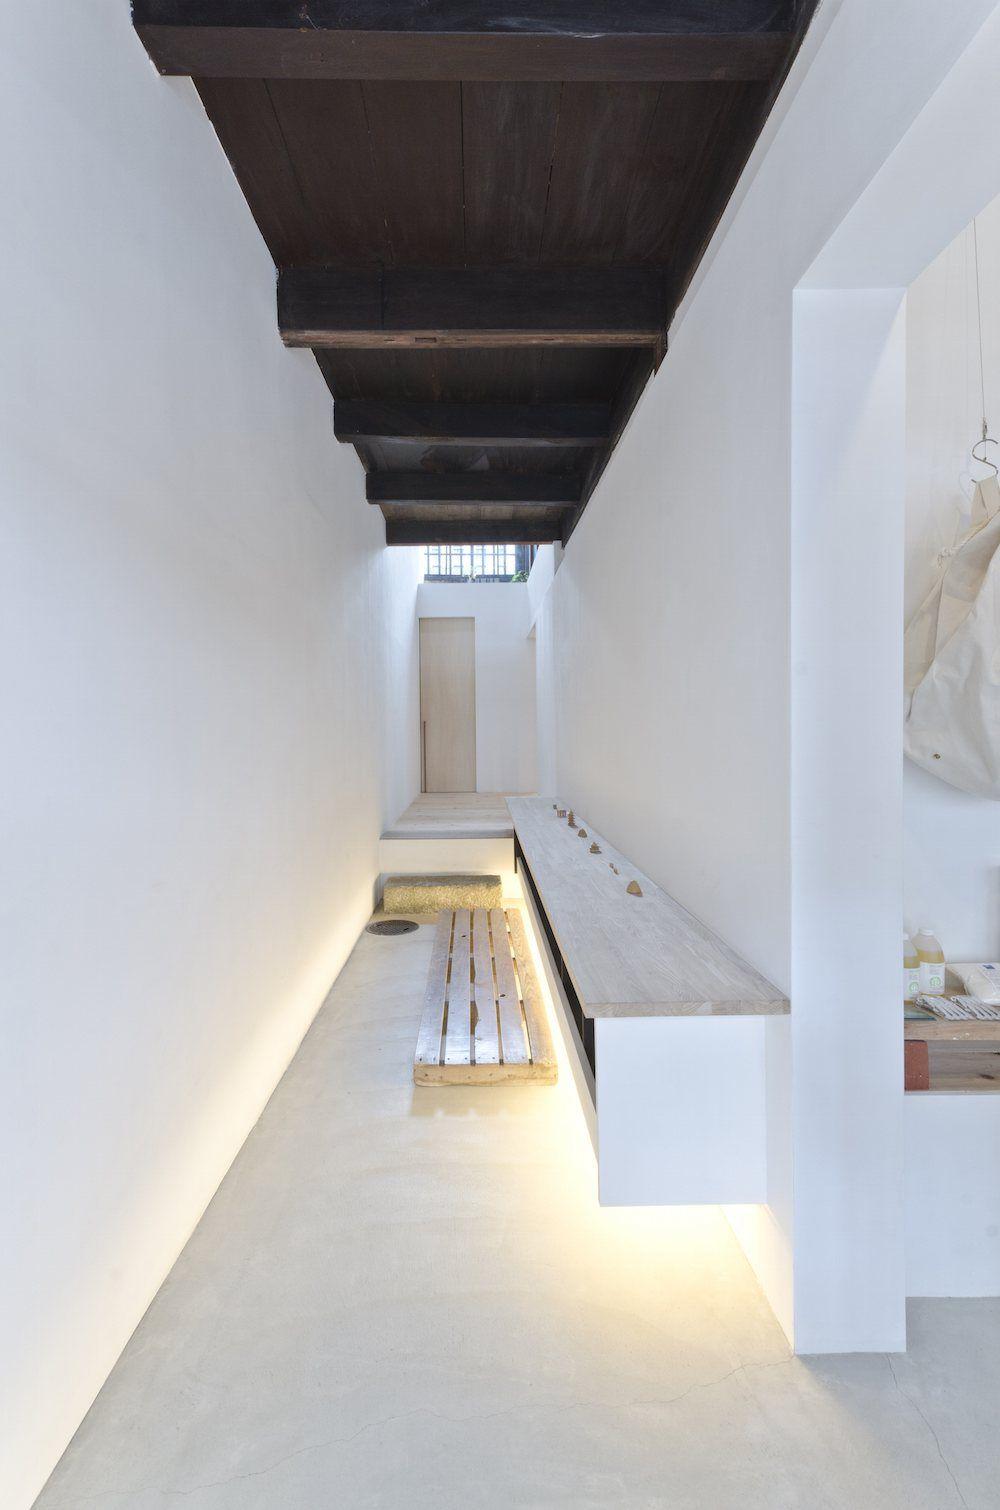 Endo Room Design: AWOMB By Endo Shojiro Design